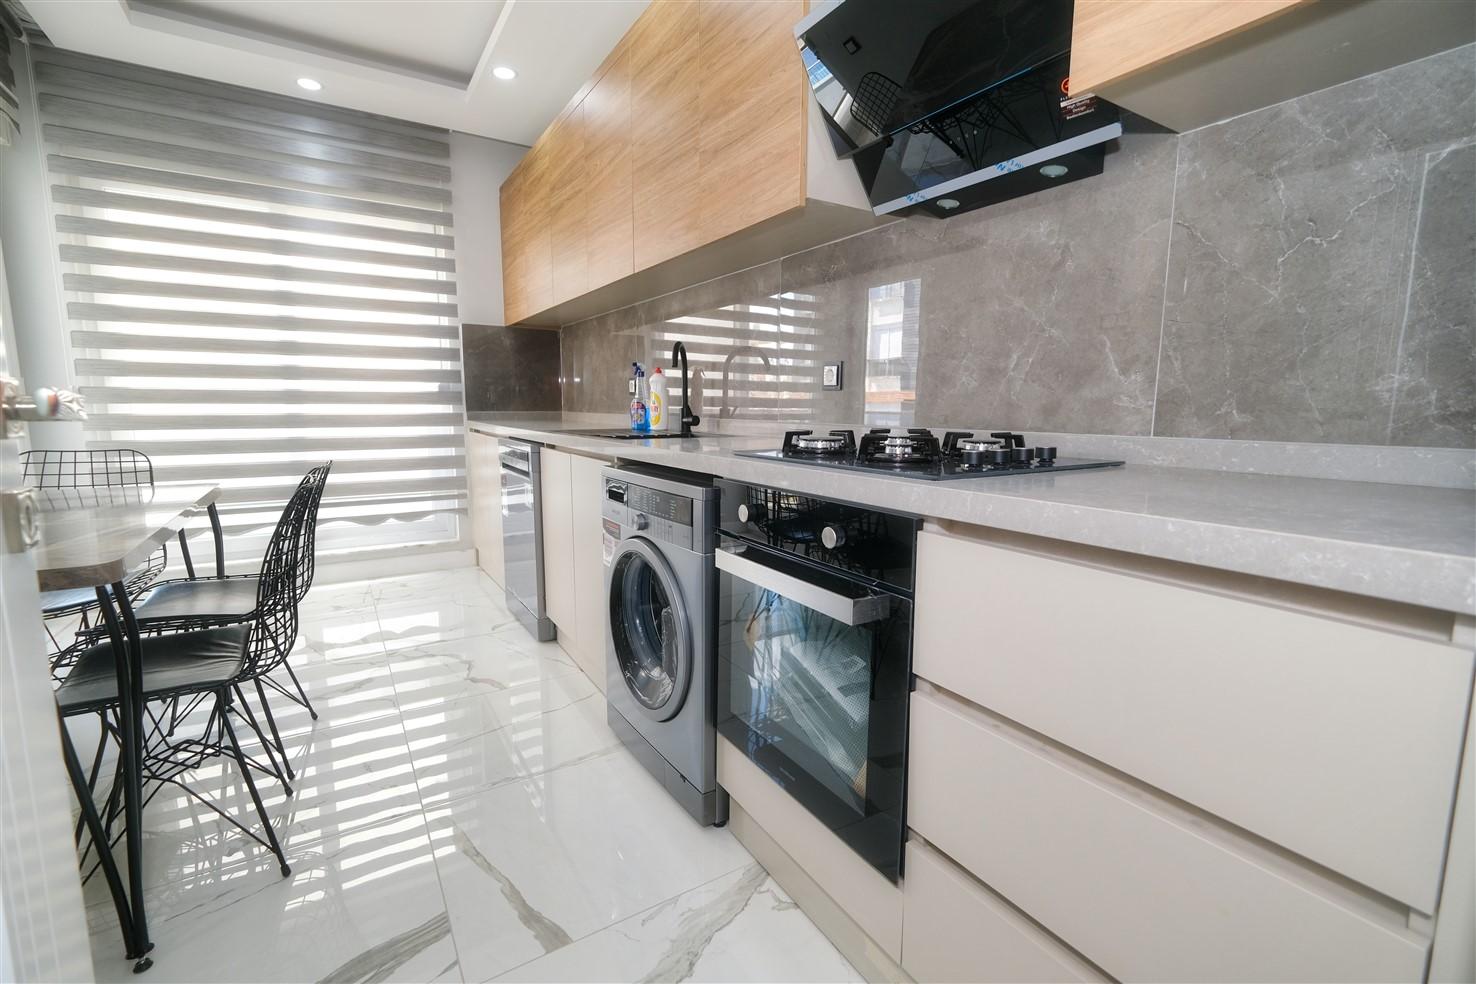 Трёхкомнатная квартира в центре Антальи - Фото 28